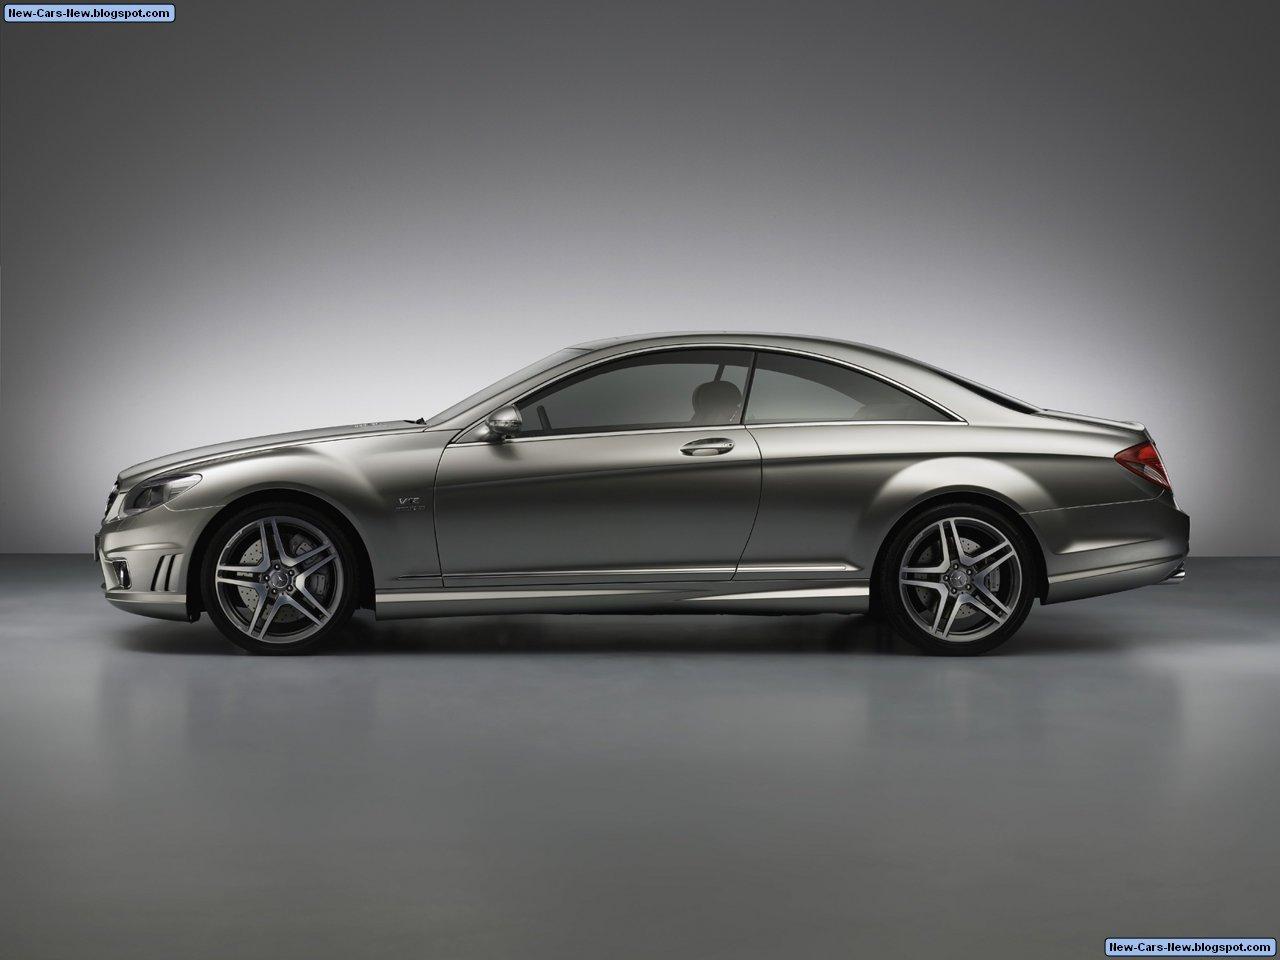 http://3.bp.blogspot.com/_U4w592tUDHM/TB2uKcLC1jI/AAAAAAAAAH8/EBaIqIEZCMU/s1600/Mercedes-Benz-CL65_AMG_2008_1280x960_wallpaper_03.jpg